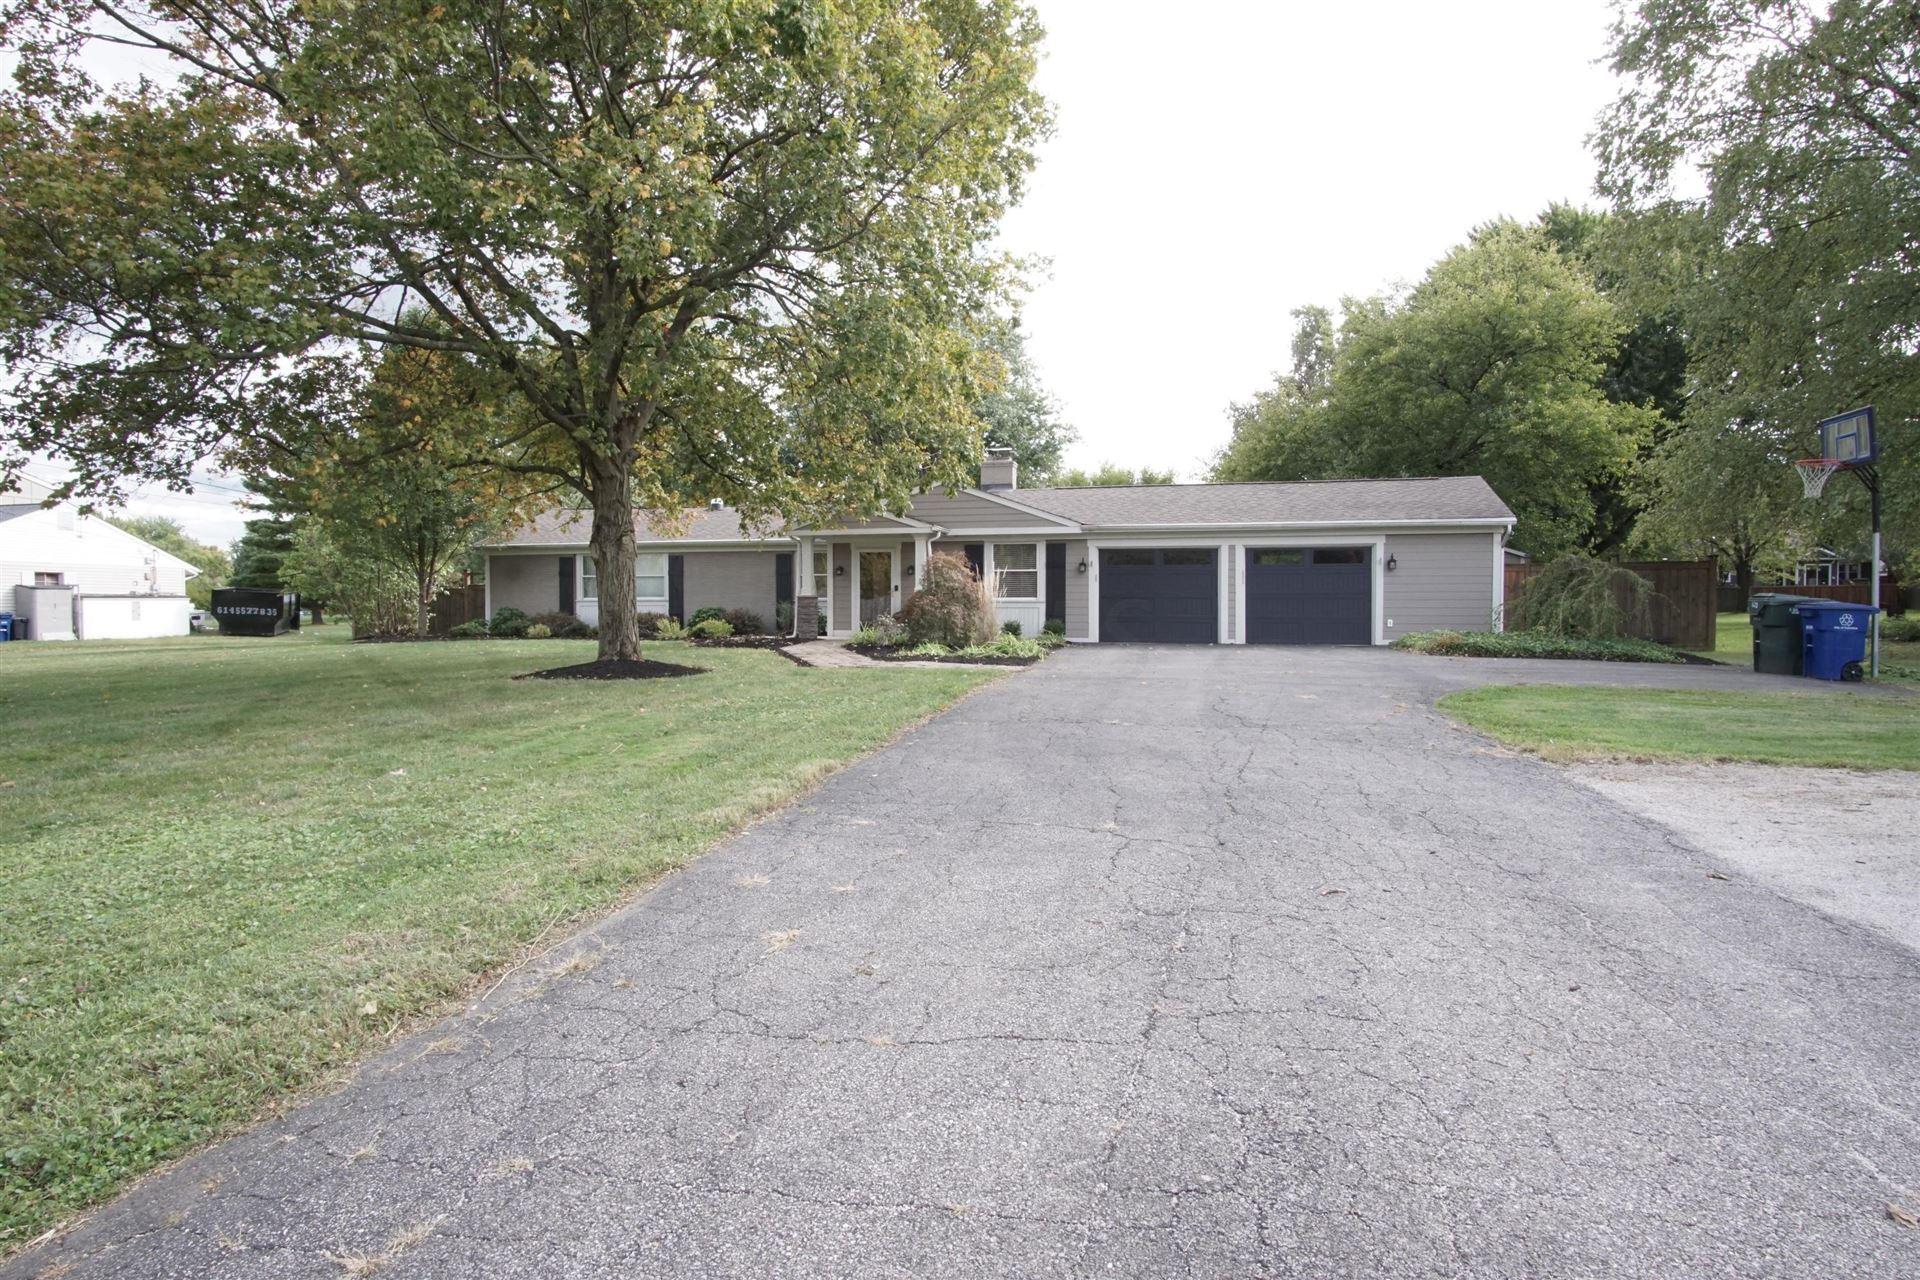 Photo of 623 Park Road, Worthington, OH 43085 (MLS # 220034920)